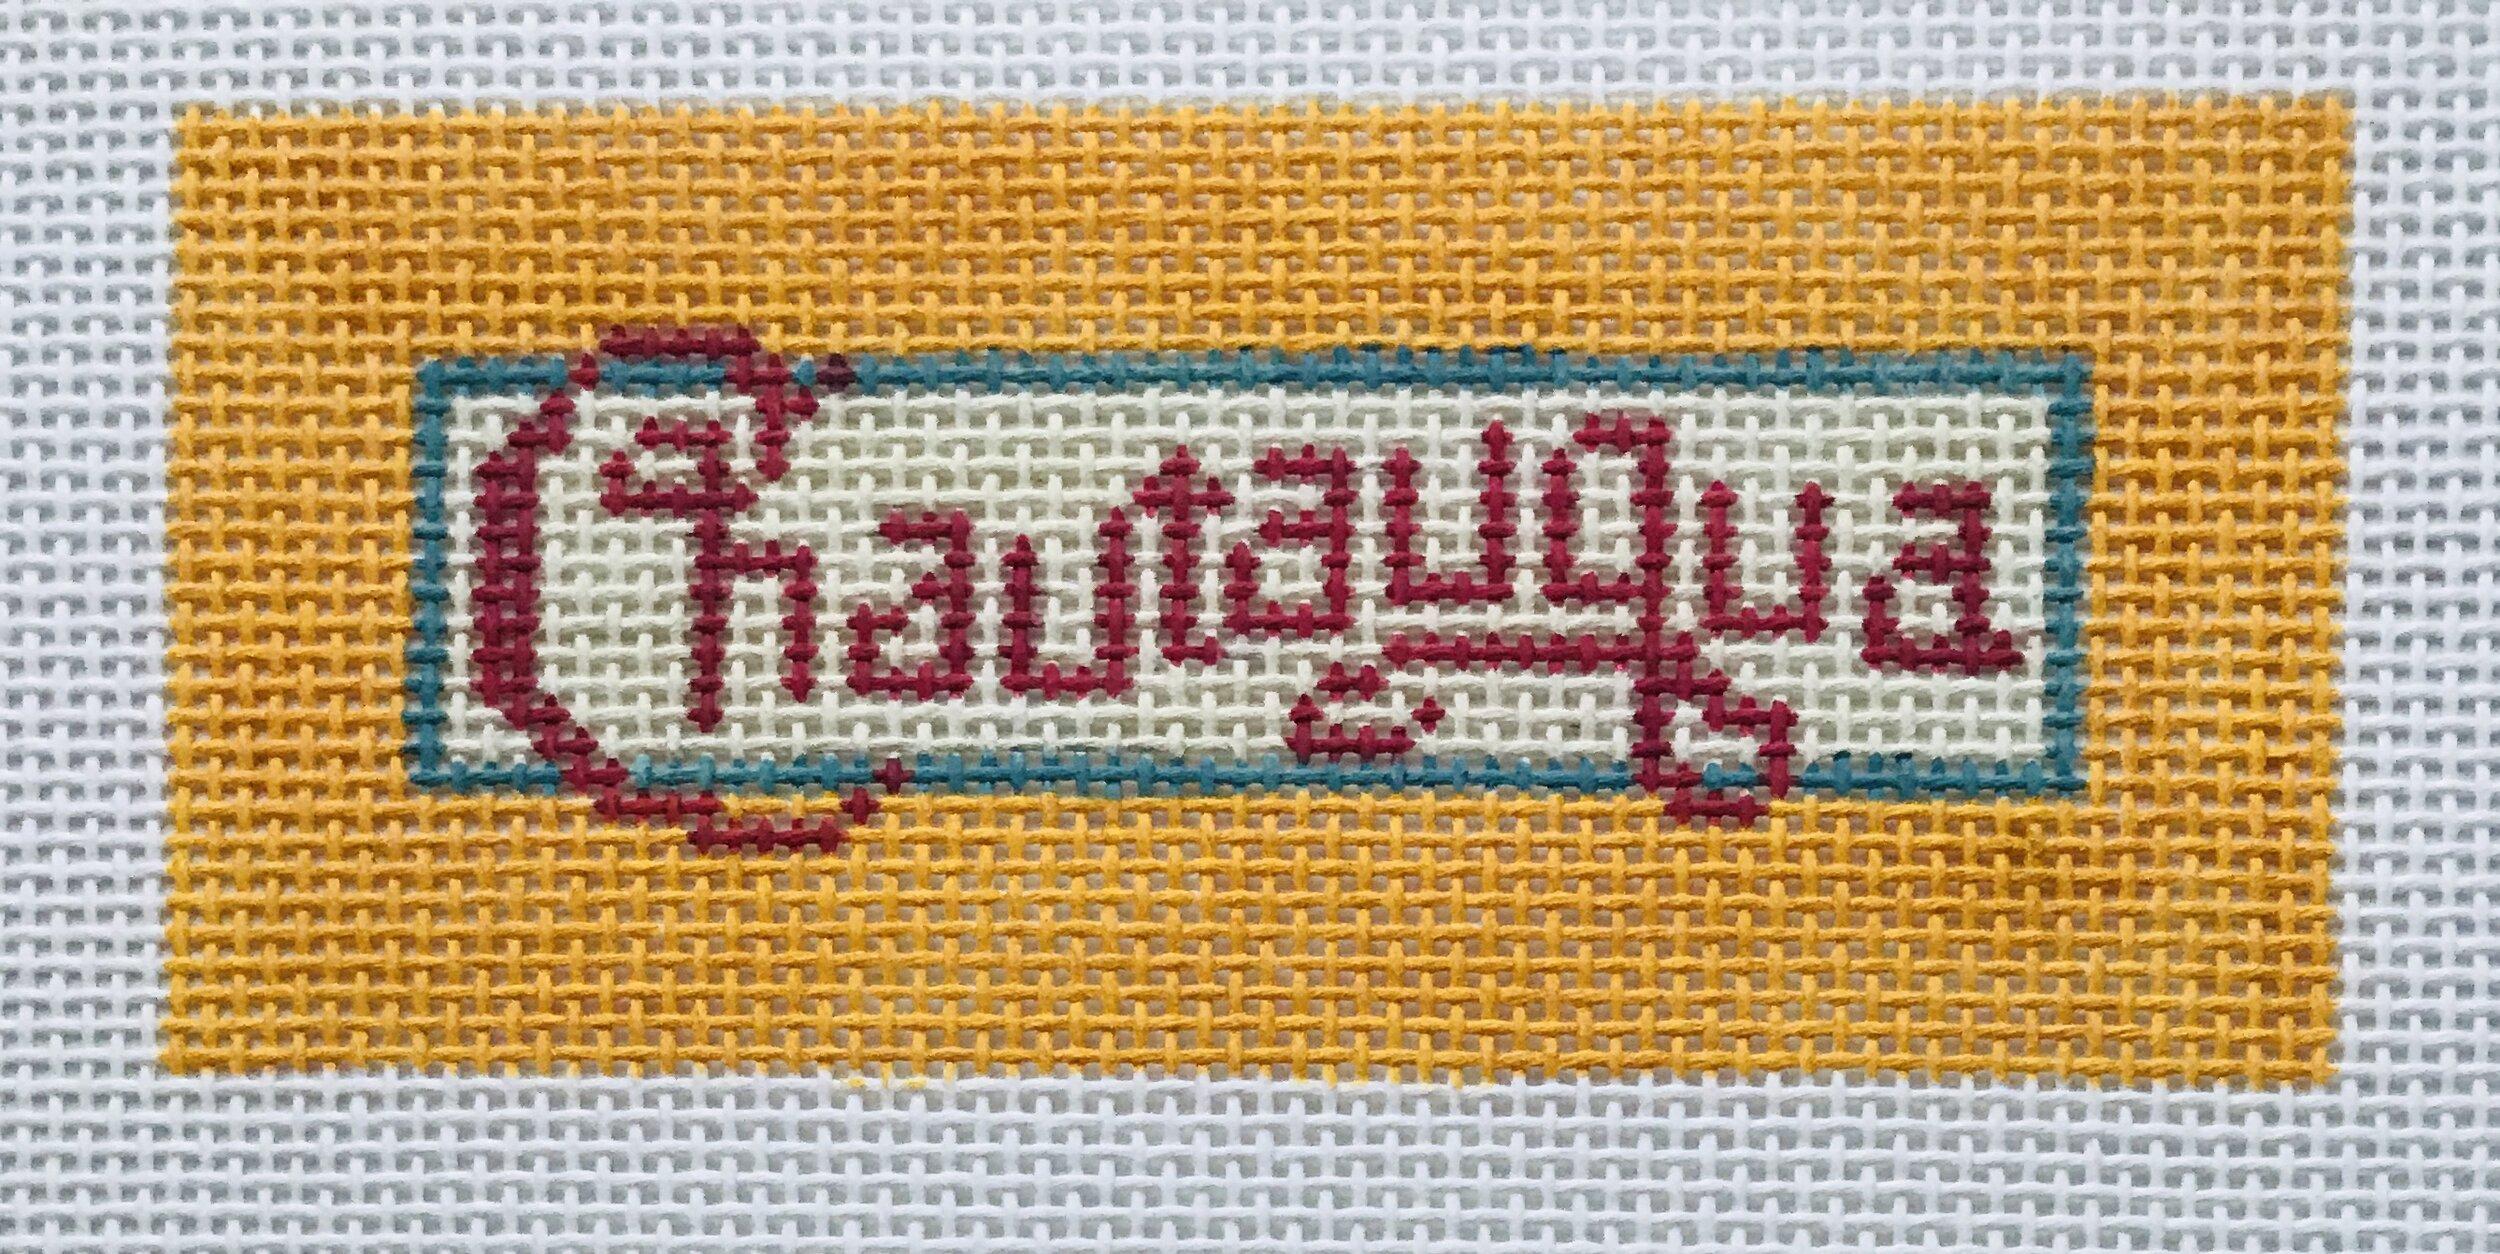 "Chautauqua - Small AL57   4.75"" x 2.25"" on 18 mesh"